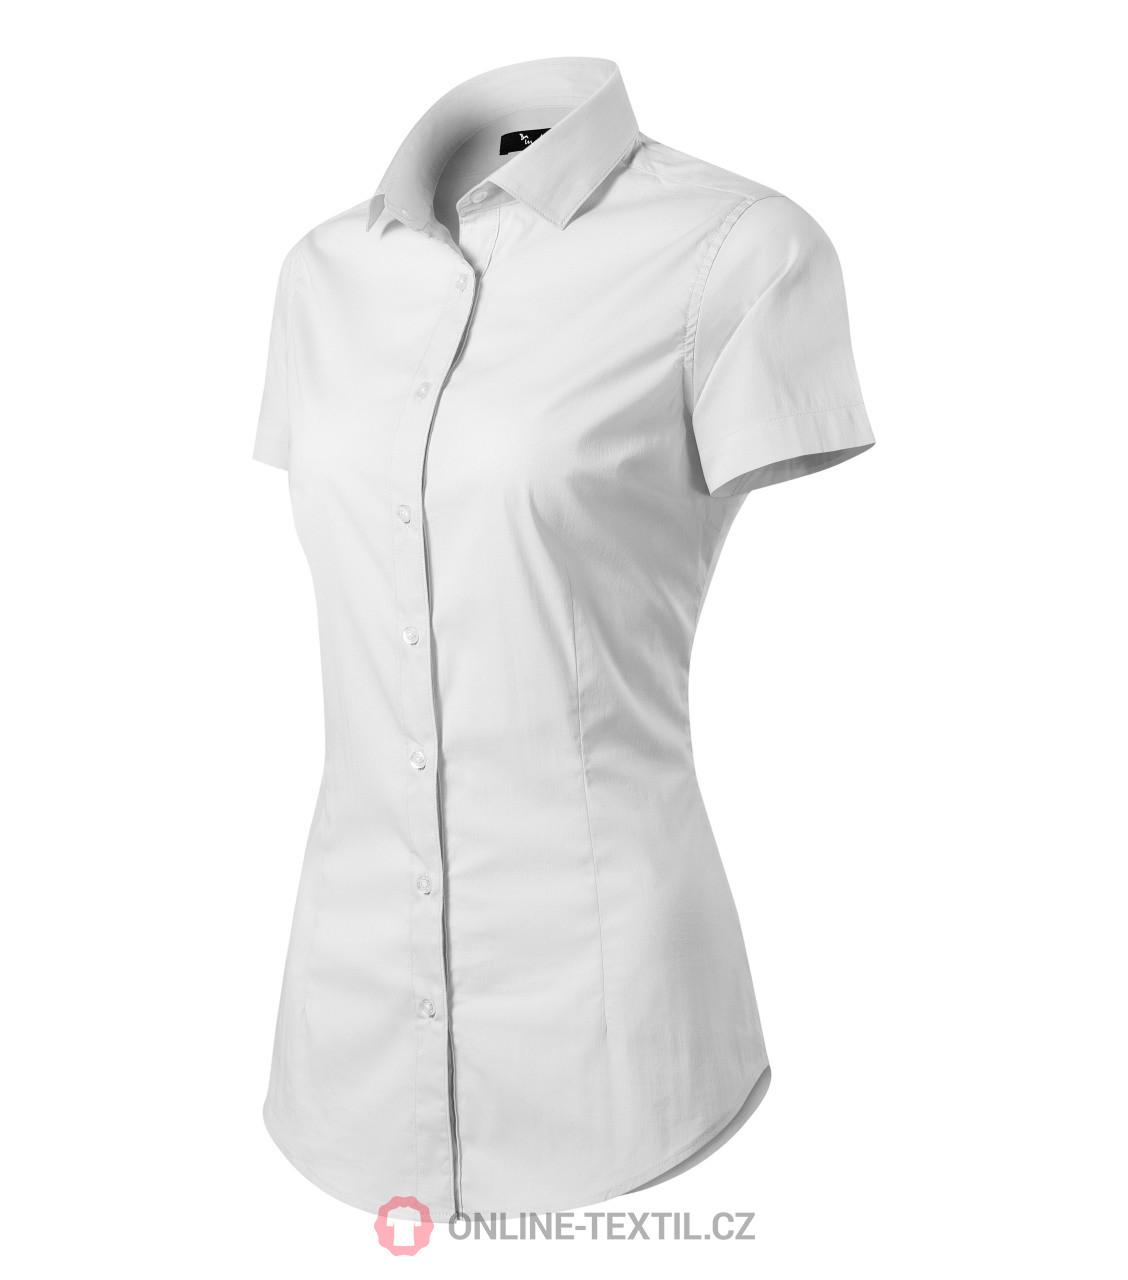 ADLER CZECH Dámská košile Malfini Premium Flash 261 - bílá z kolekce ... 16ba341fa2